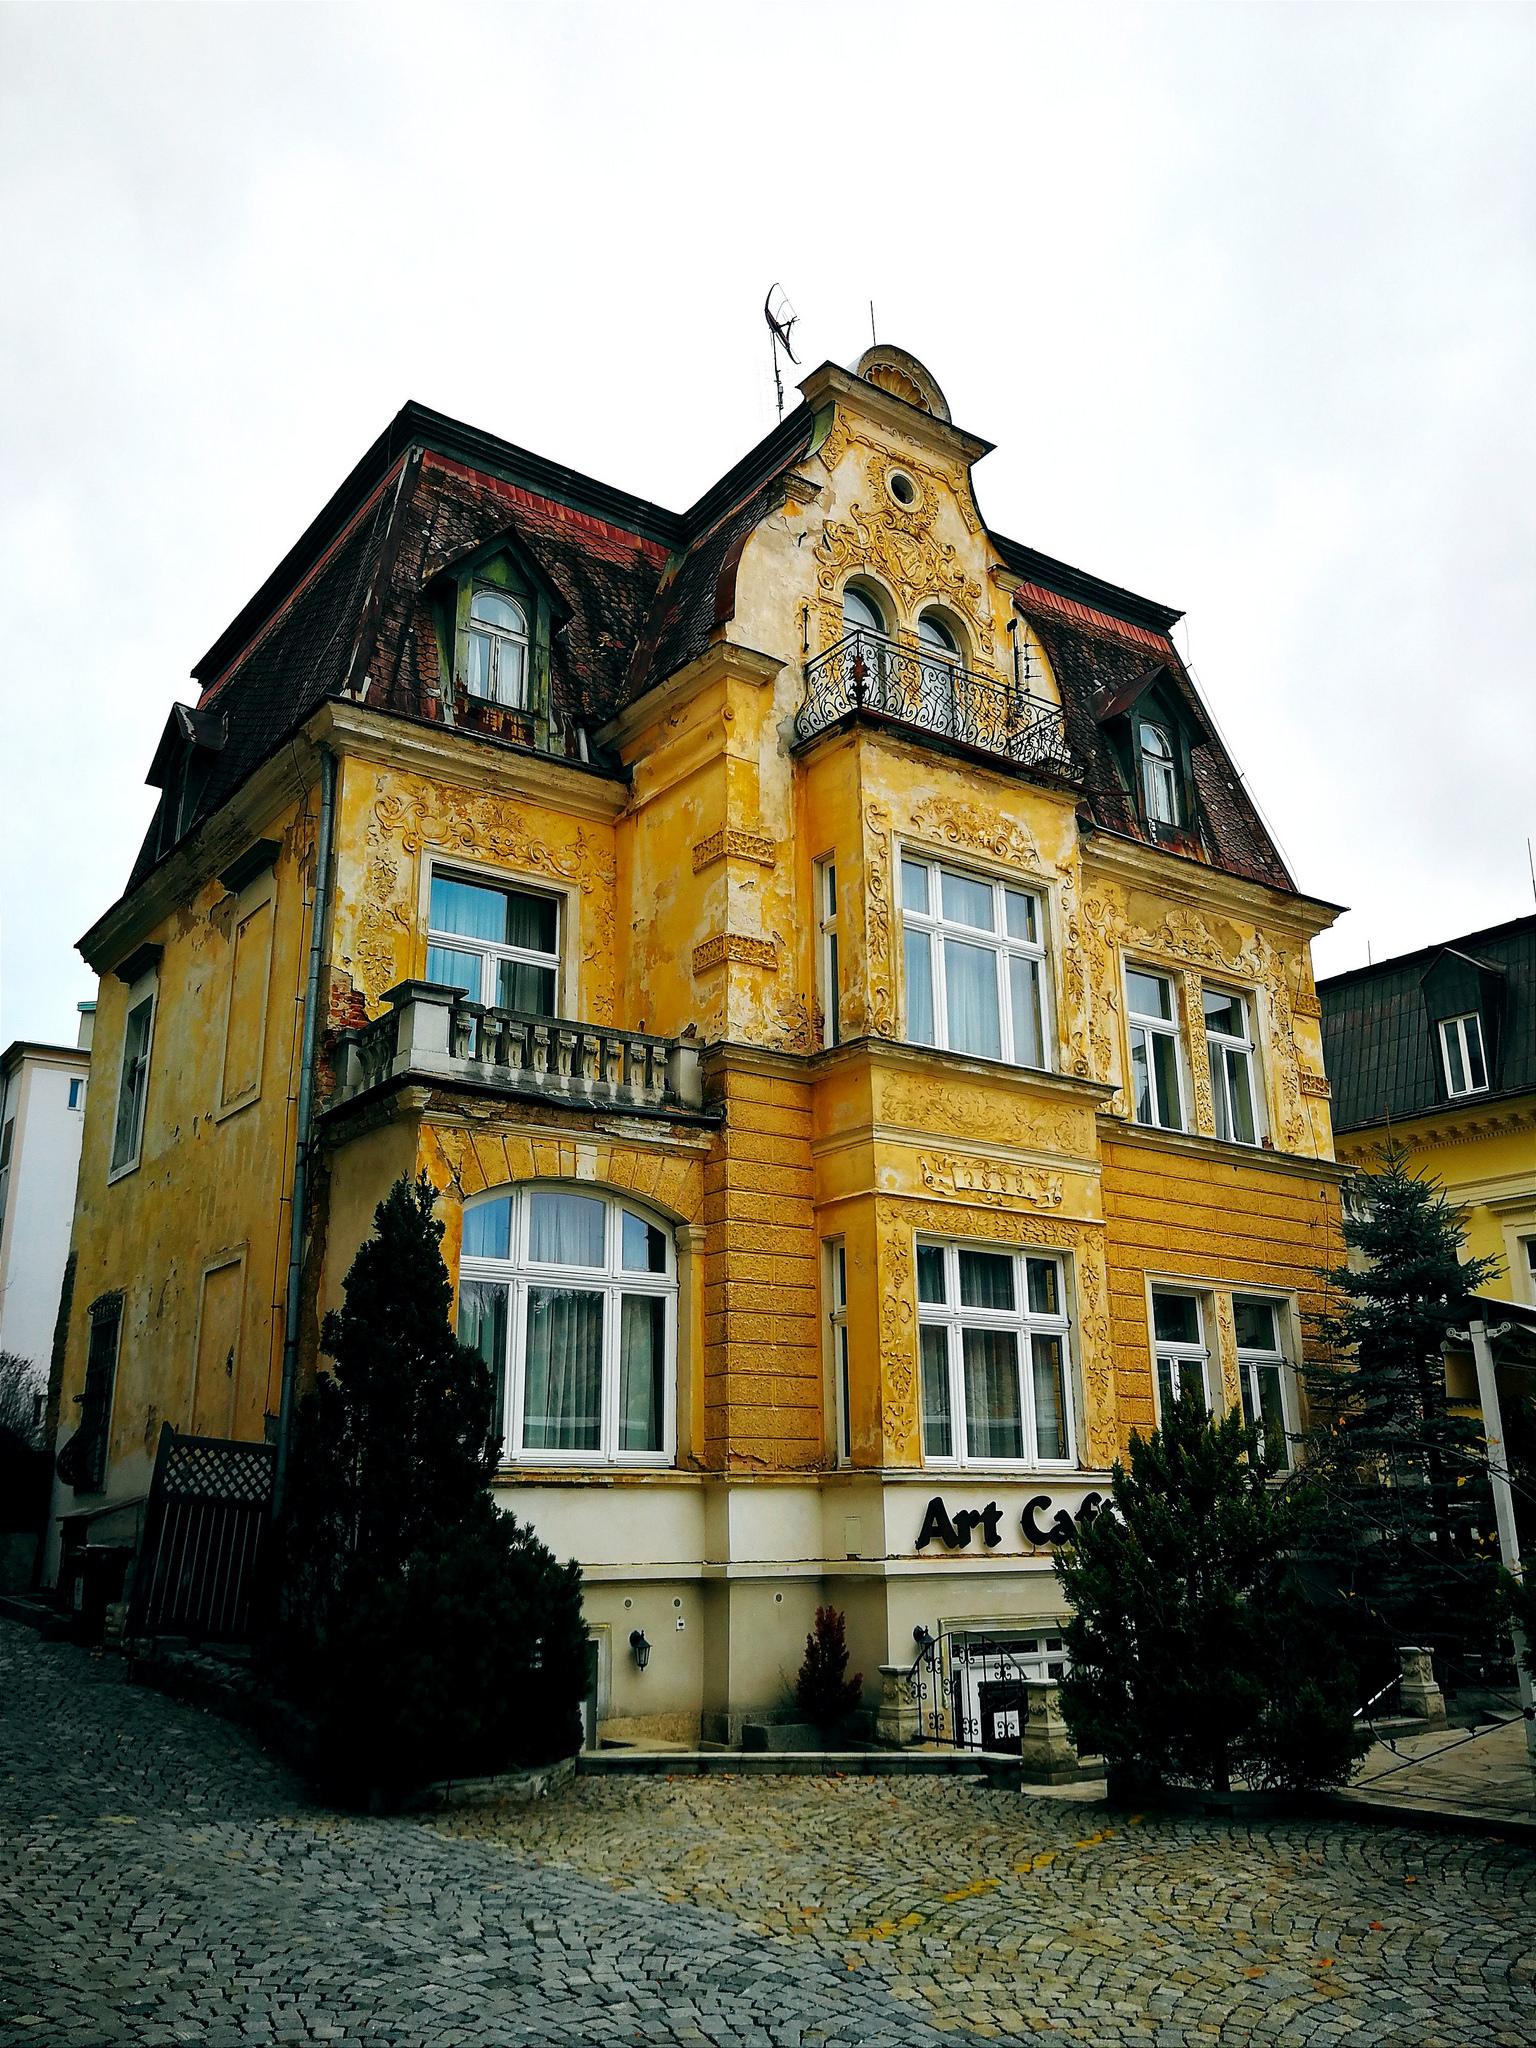 Ancient architecture in Mariánské Lázně, Czech Republic